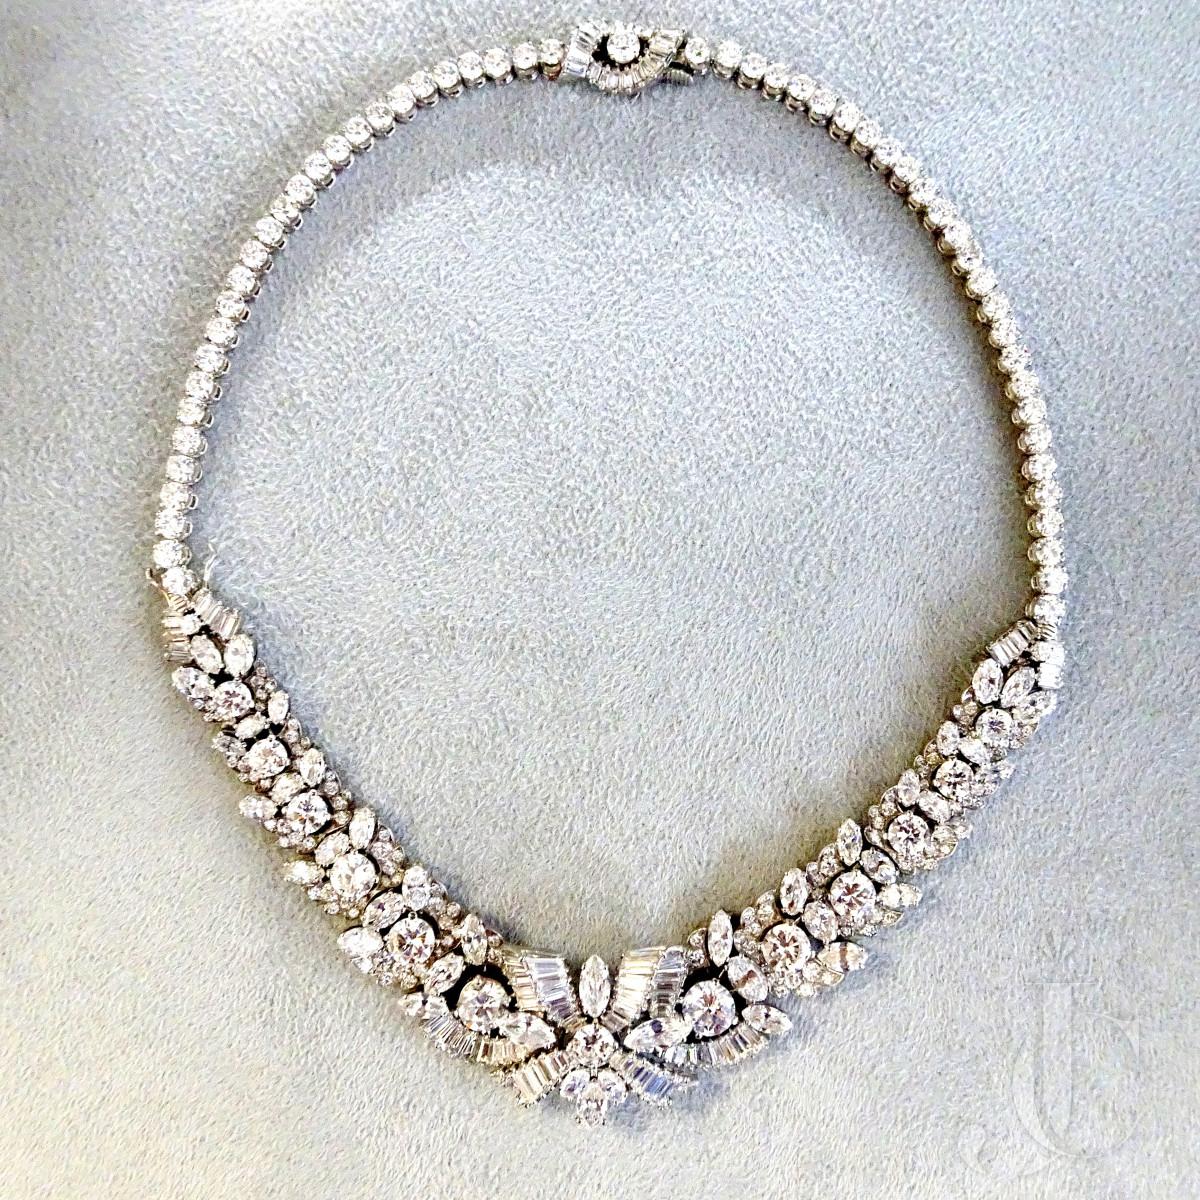 Diamond Collier/Bracelet